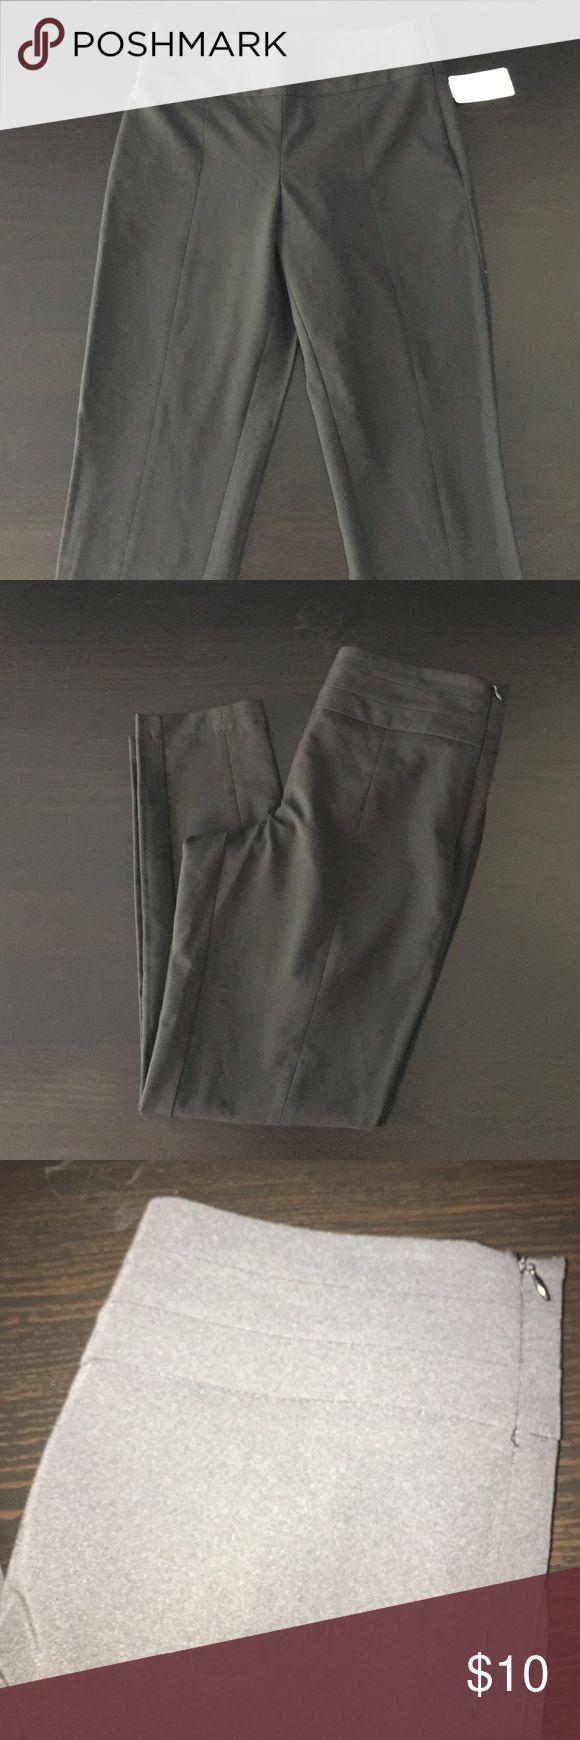 Black ankle length slim fit pants Black ankle length slim fit pants with waist detail. Forever 21 Pants Ankle & Cropped